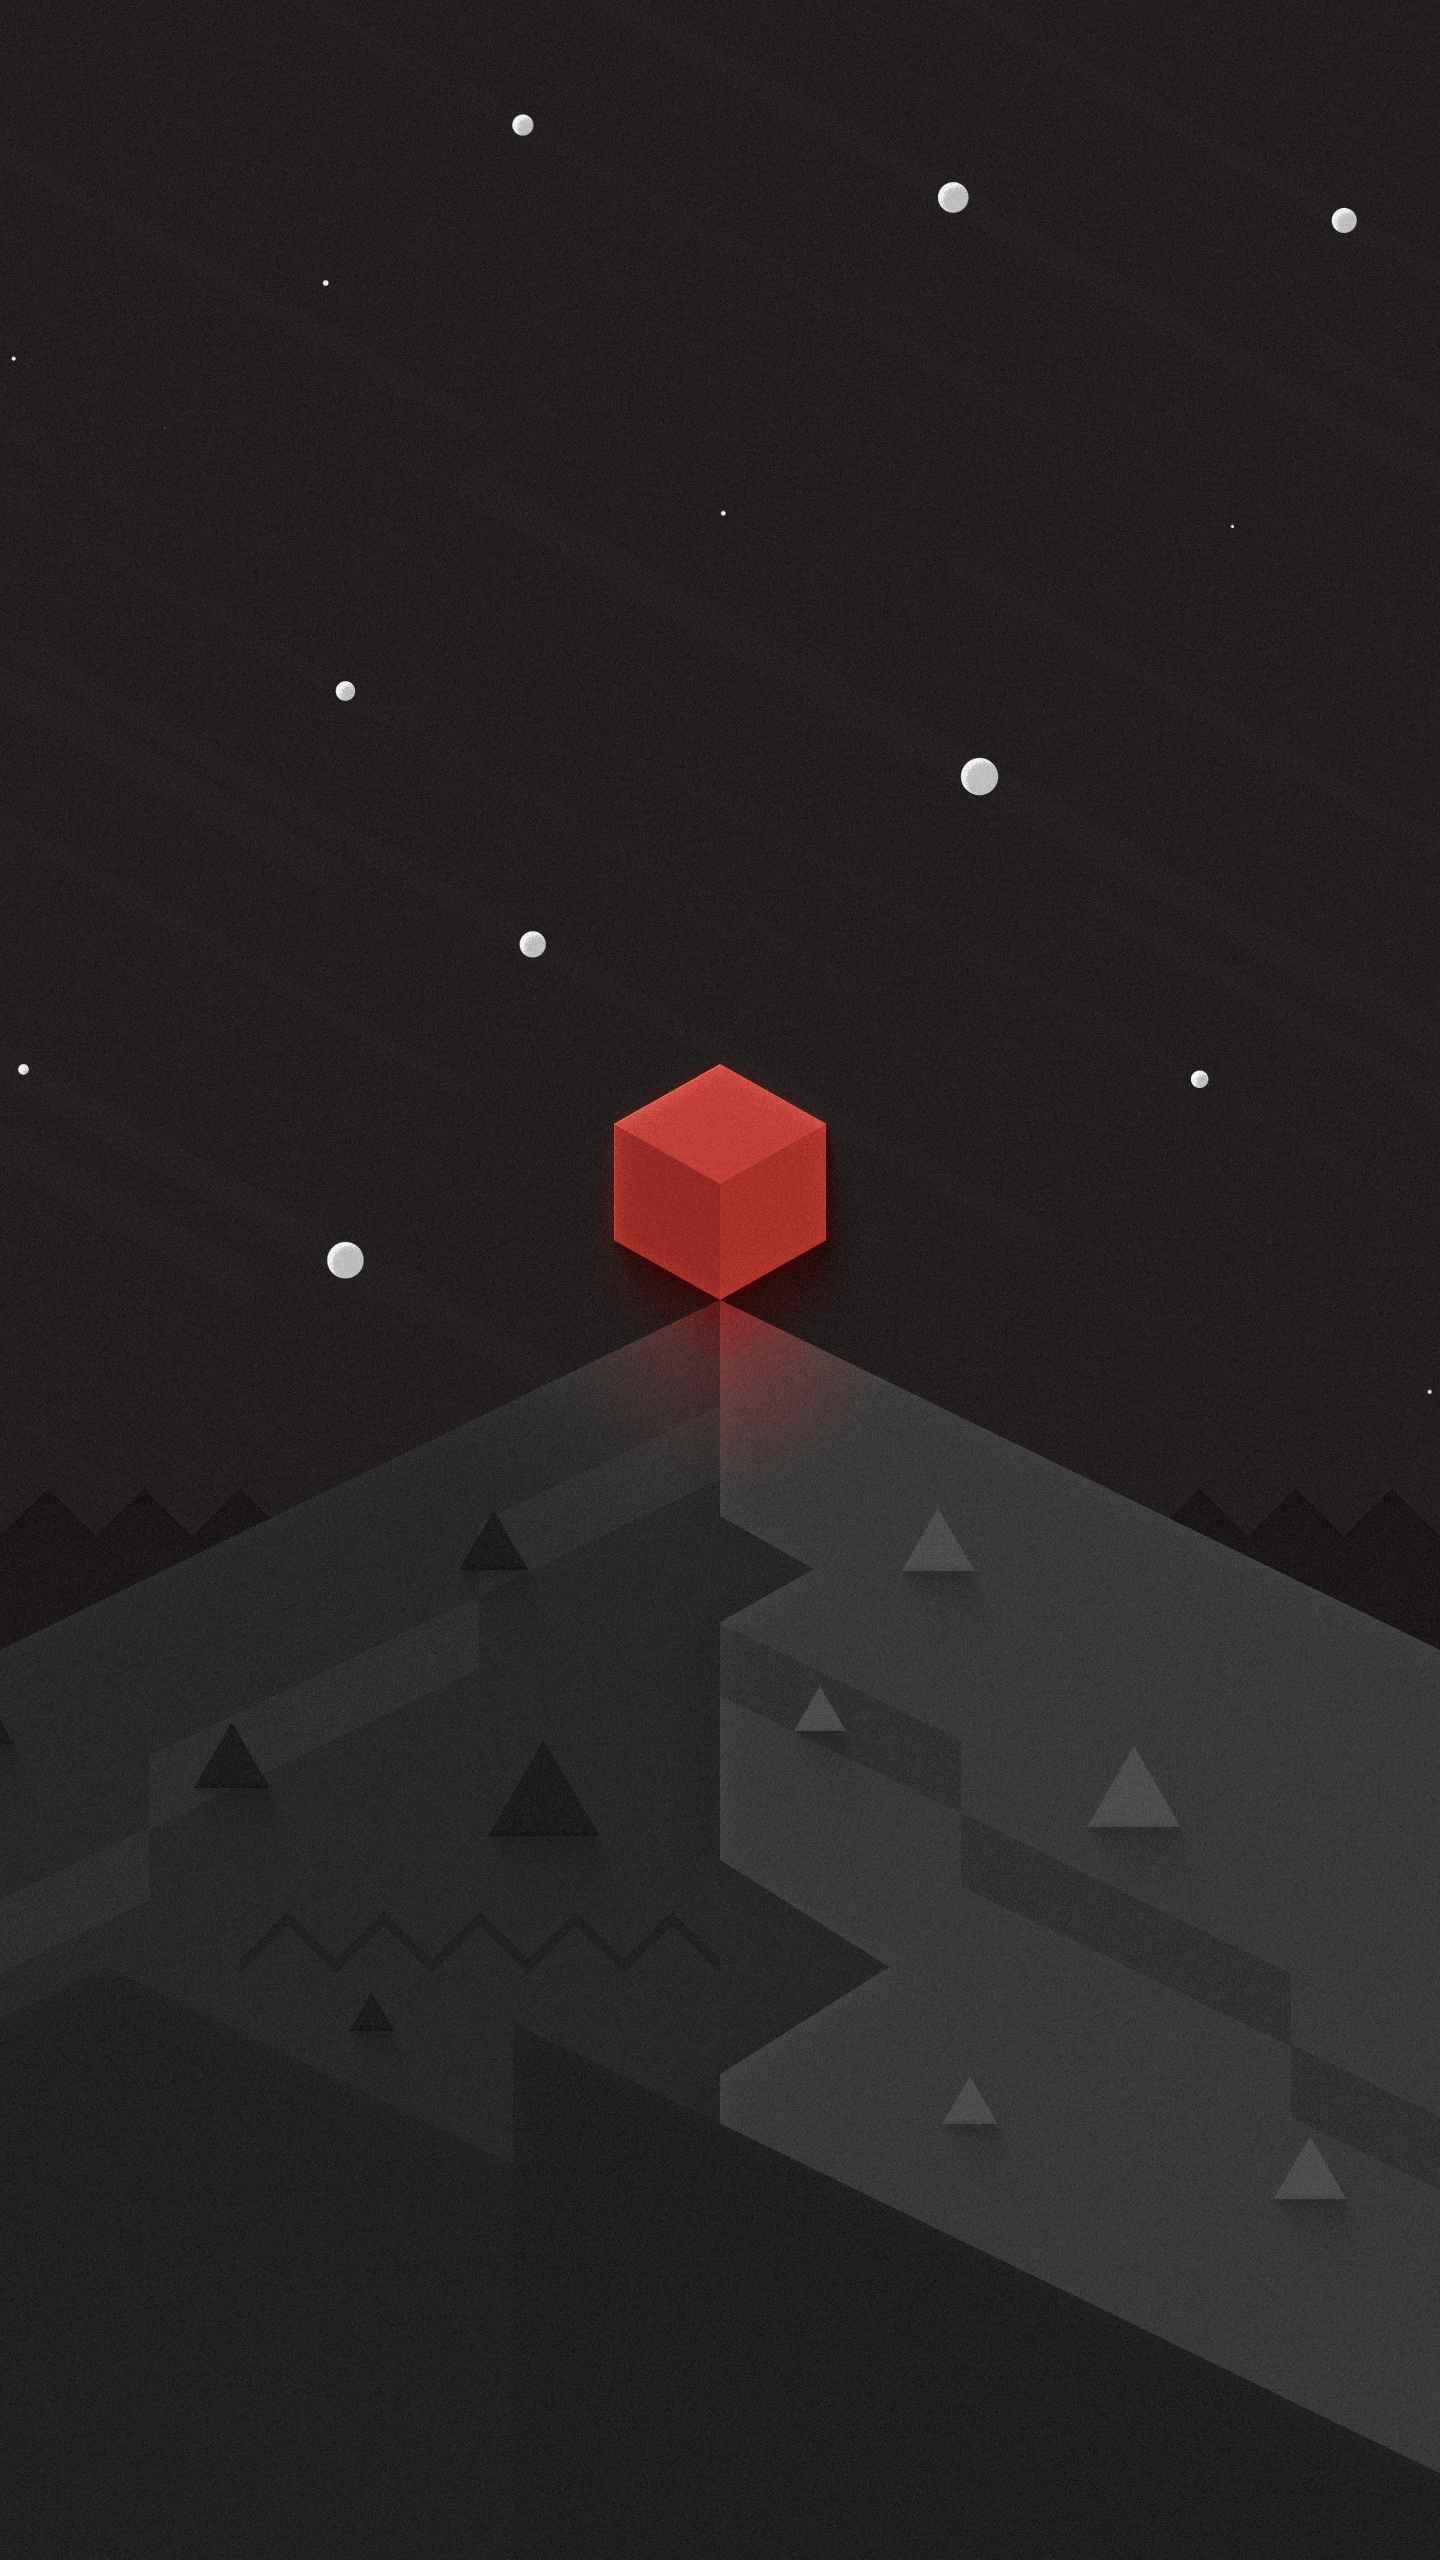 Red Hex iPhone Wallpaper